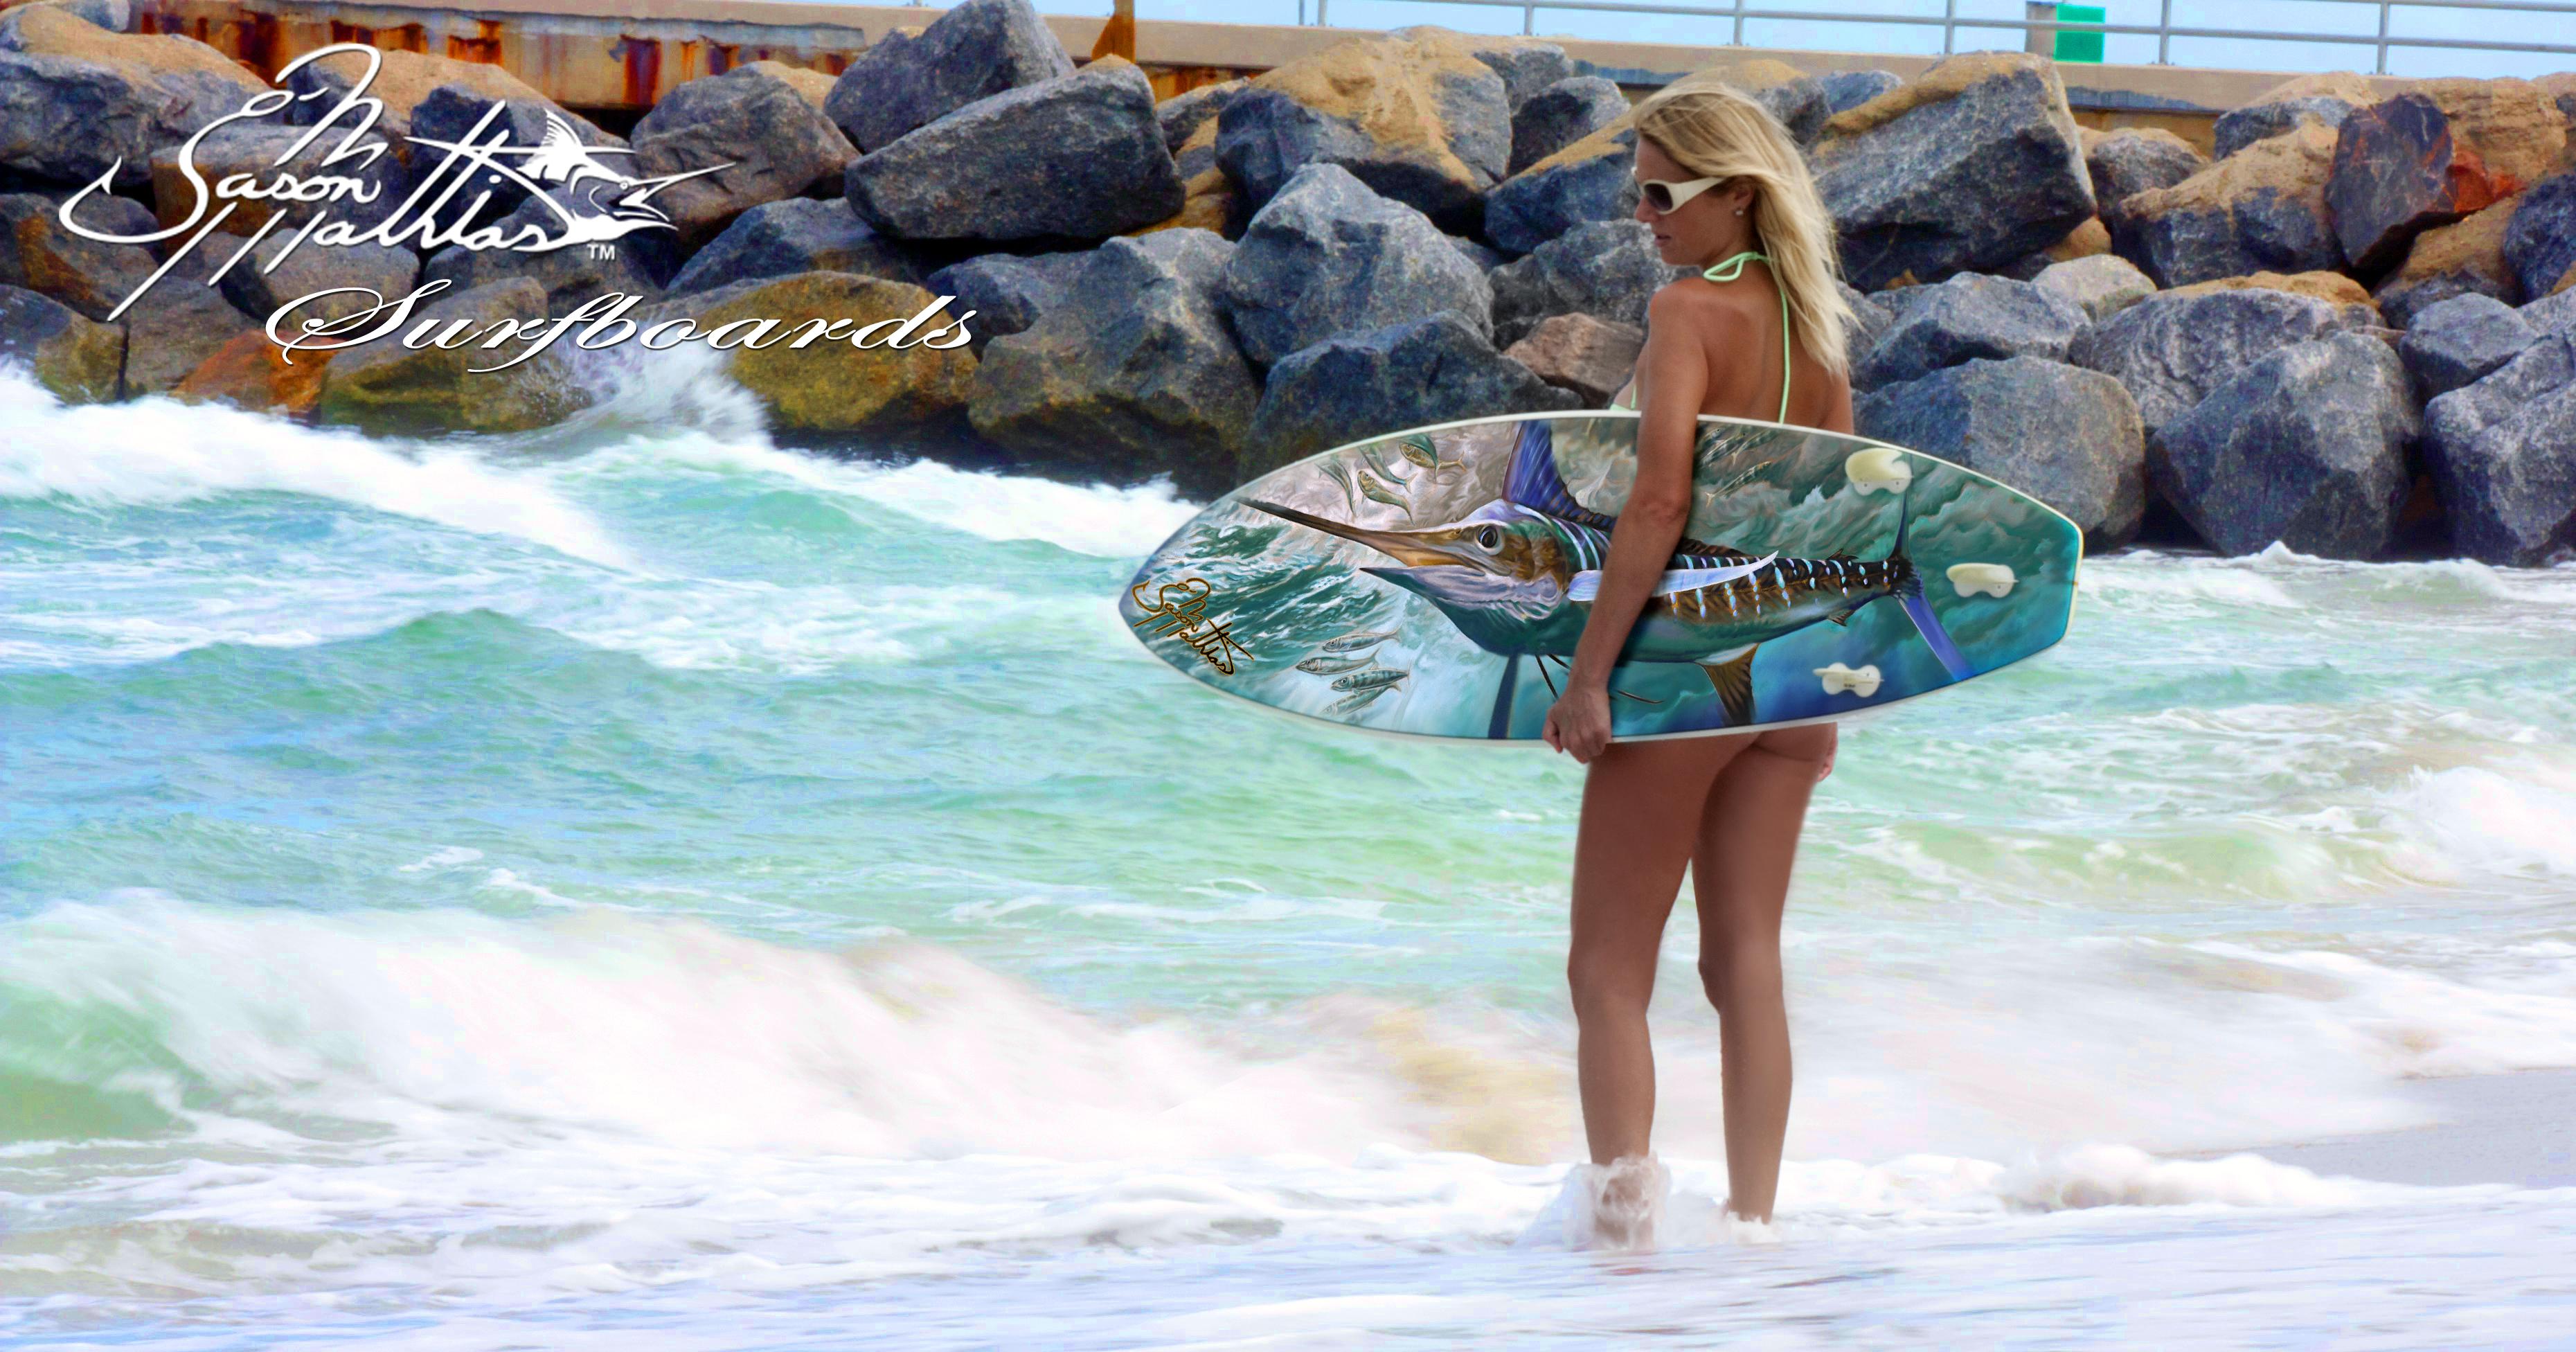 jason-mathias-gamefish-sportfish-marlin-surfboard-art-designs.jpg